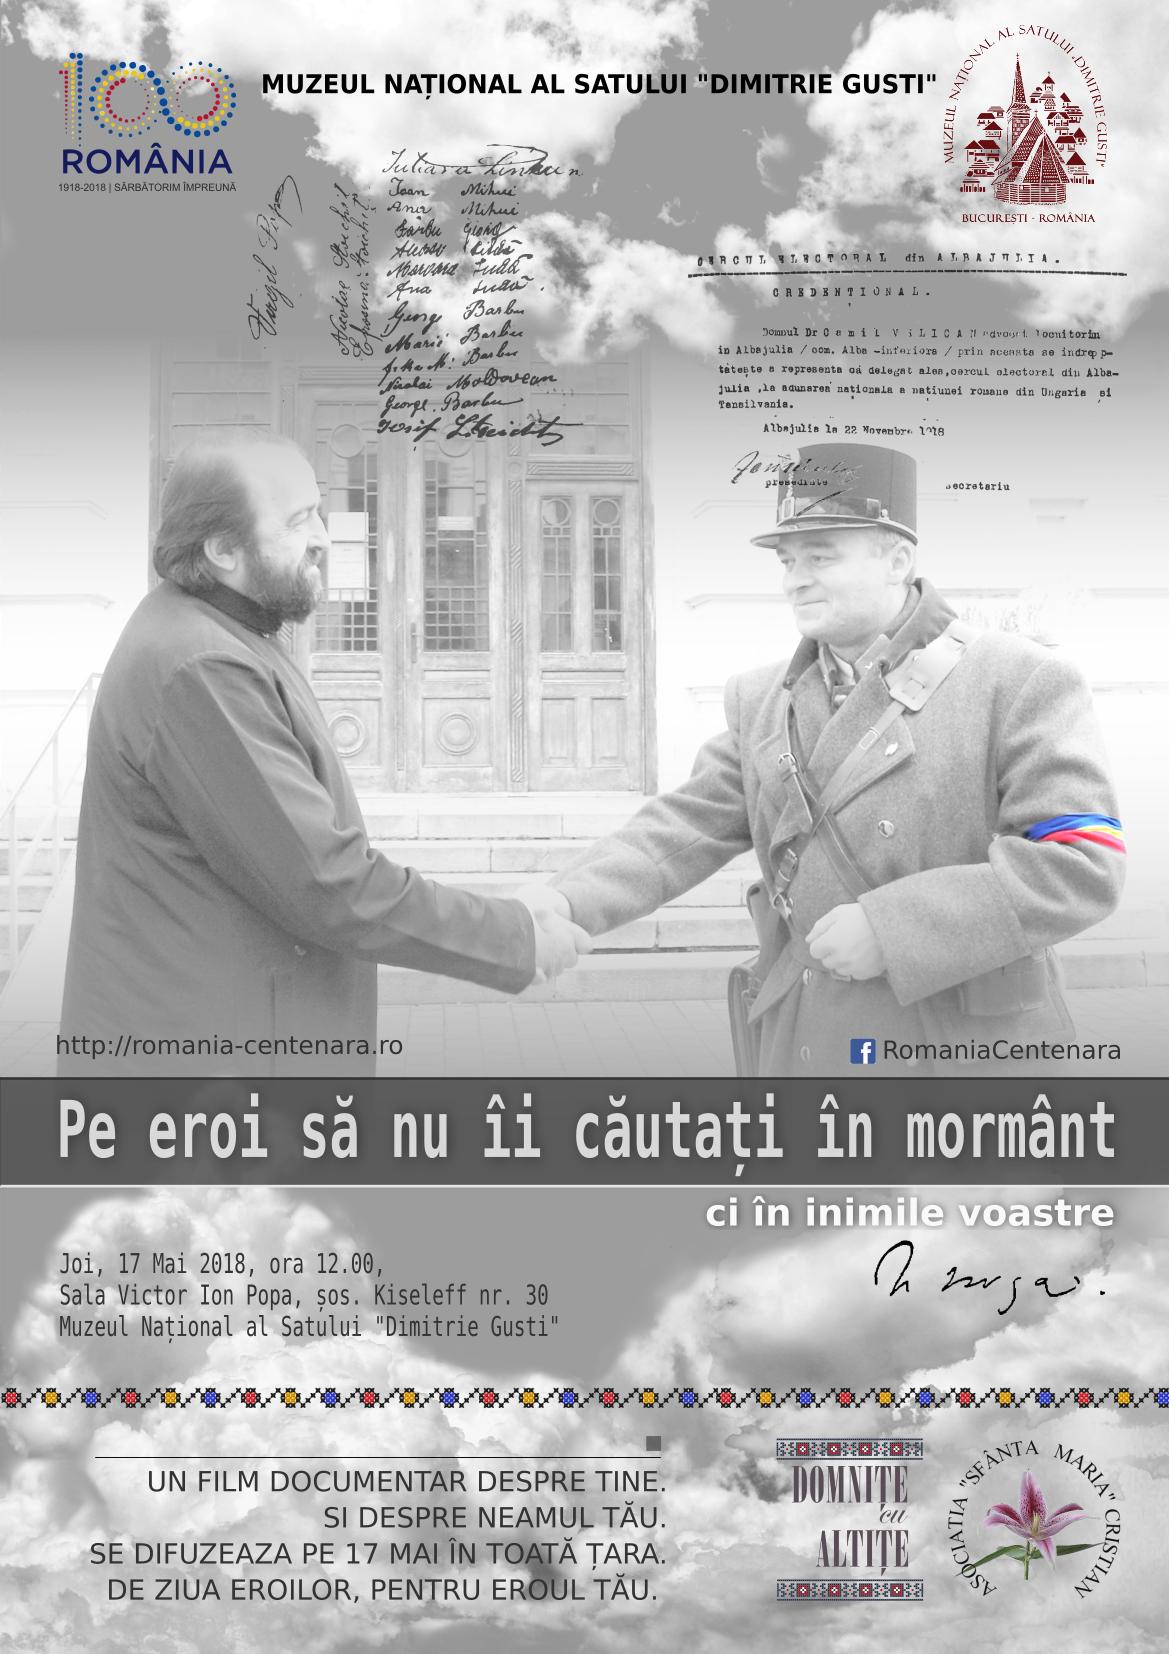 Romania Centenara